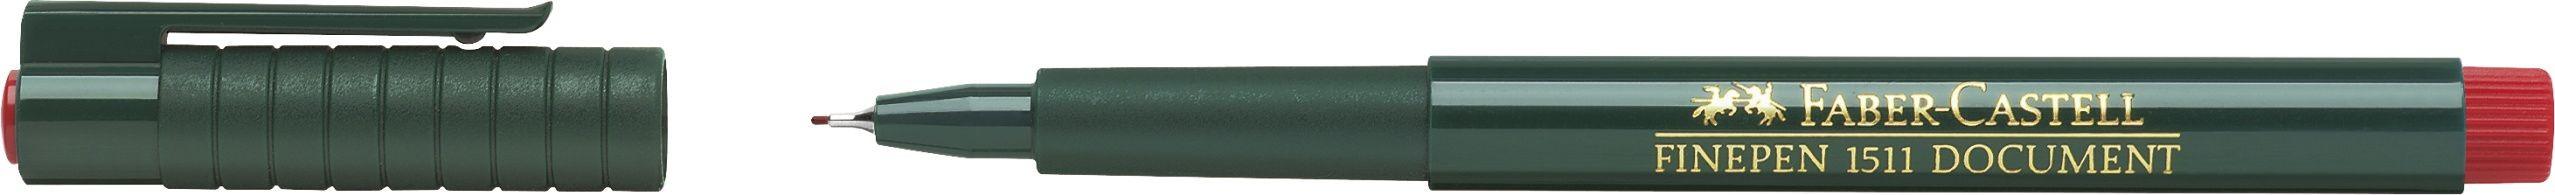 LINER 0.4MM ROSU FINEPEN 1511 FABER-CASTELL